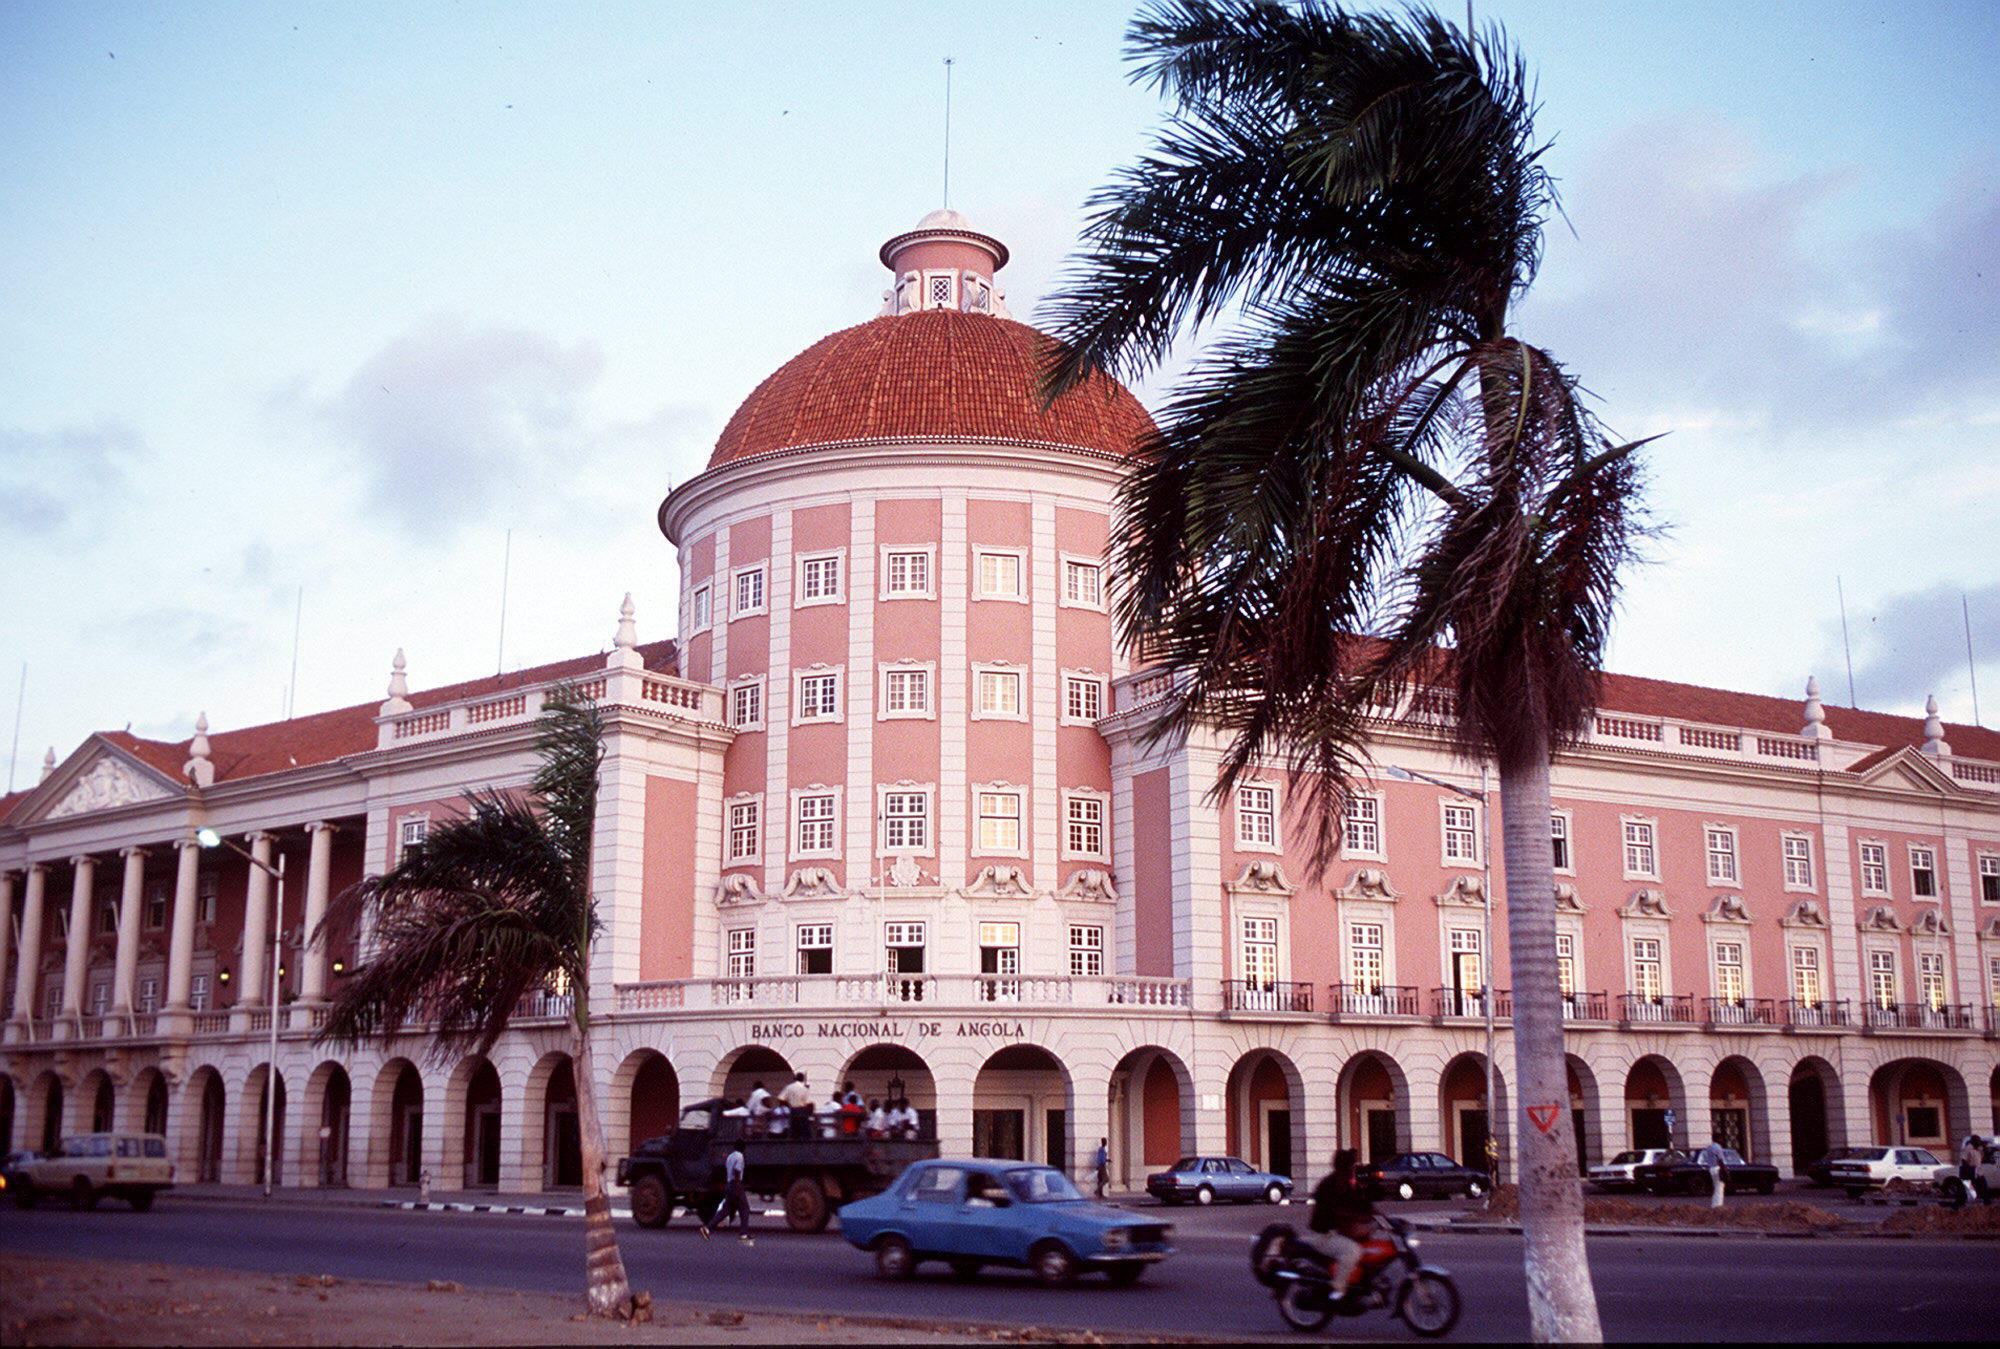 Aumento de moeda externa beneficia bancos angolanos